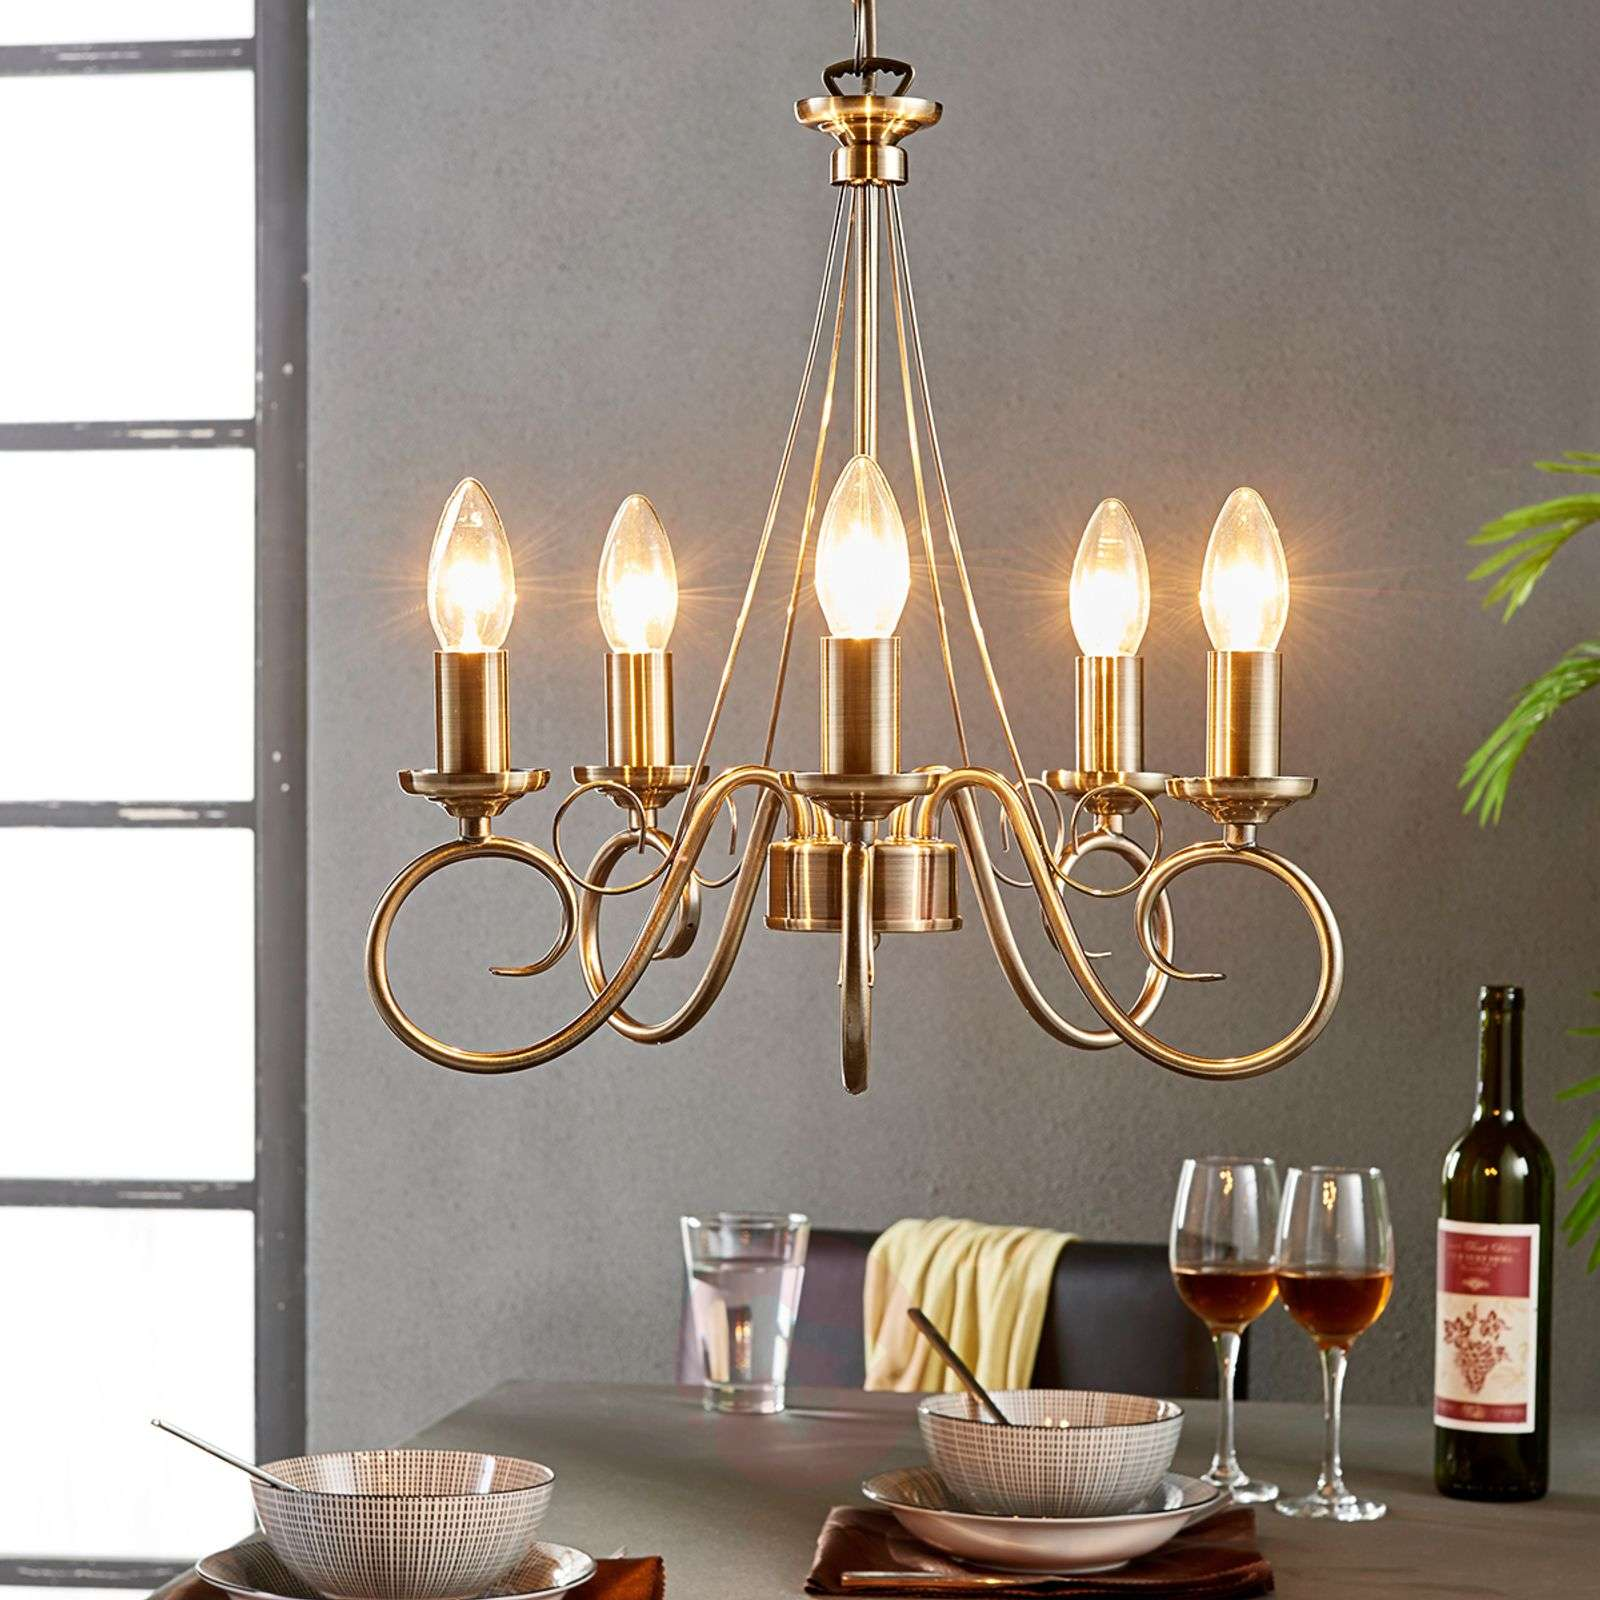 Marnia chandelier in antique brass, 5-bulb-9621015-03